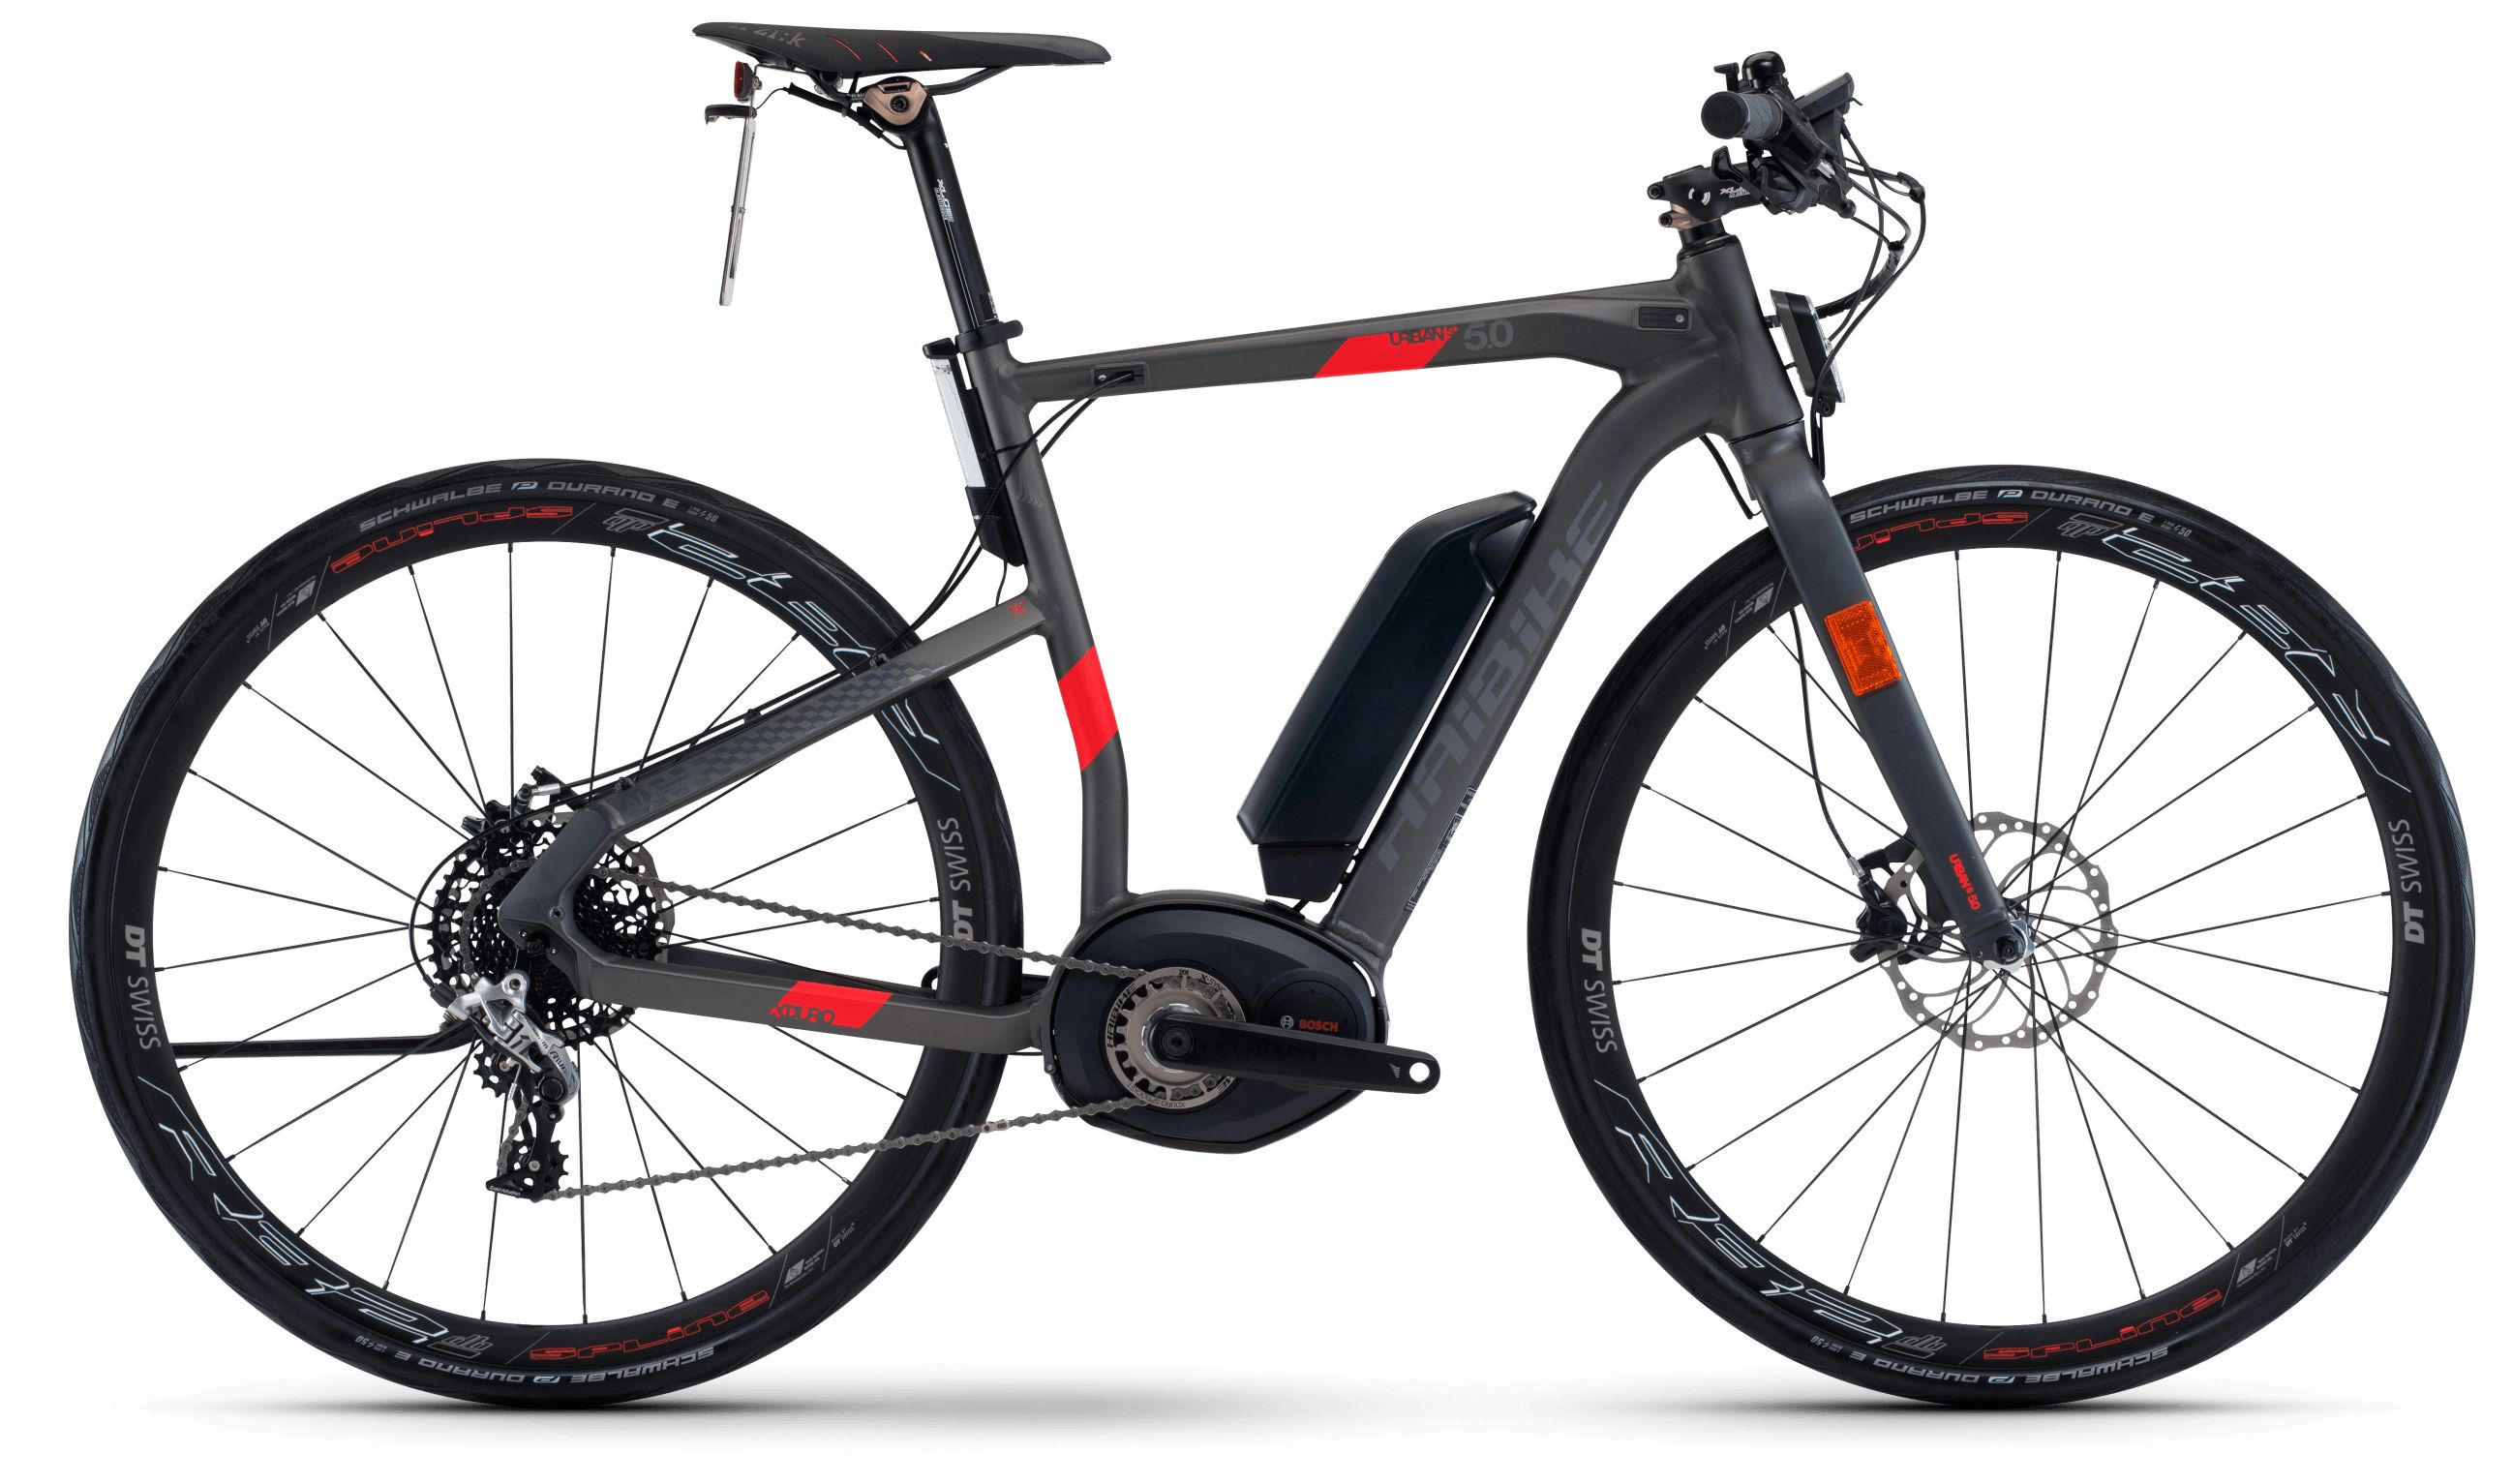 Велосипед Haibike Xduro Urban S 5.0 500Wh 11s Rival 2018